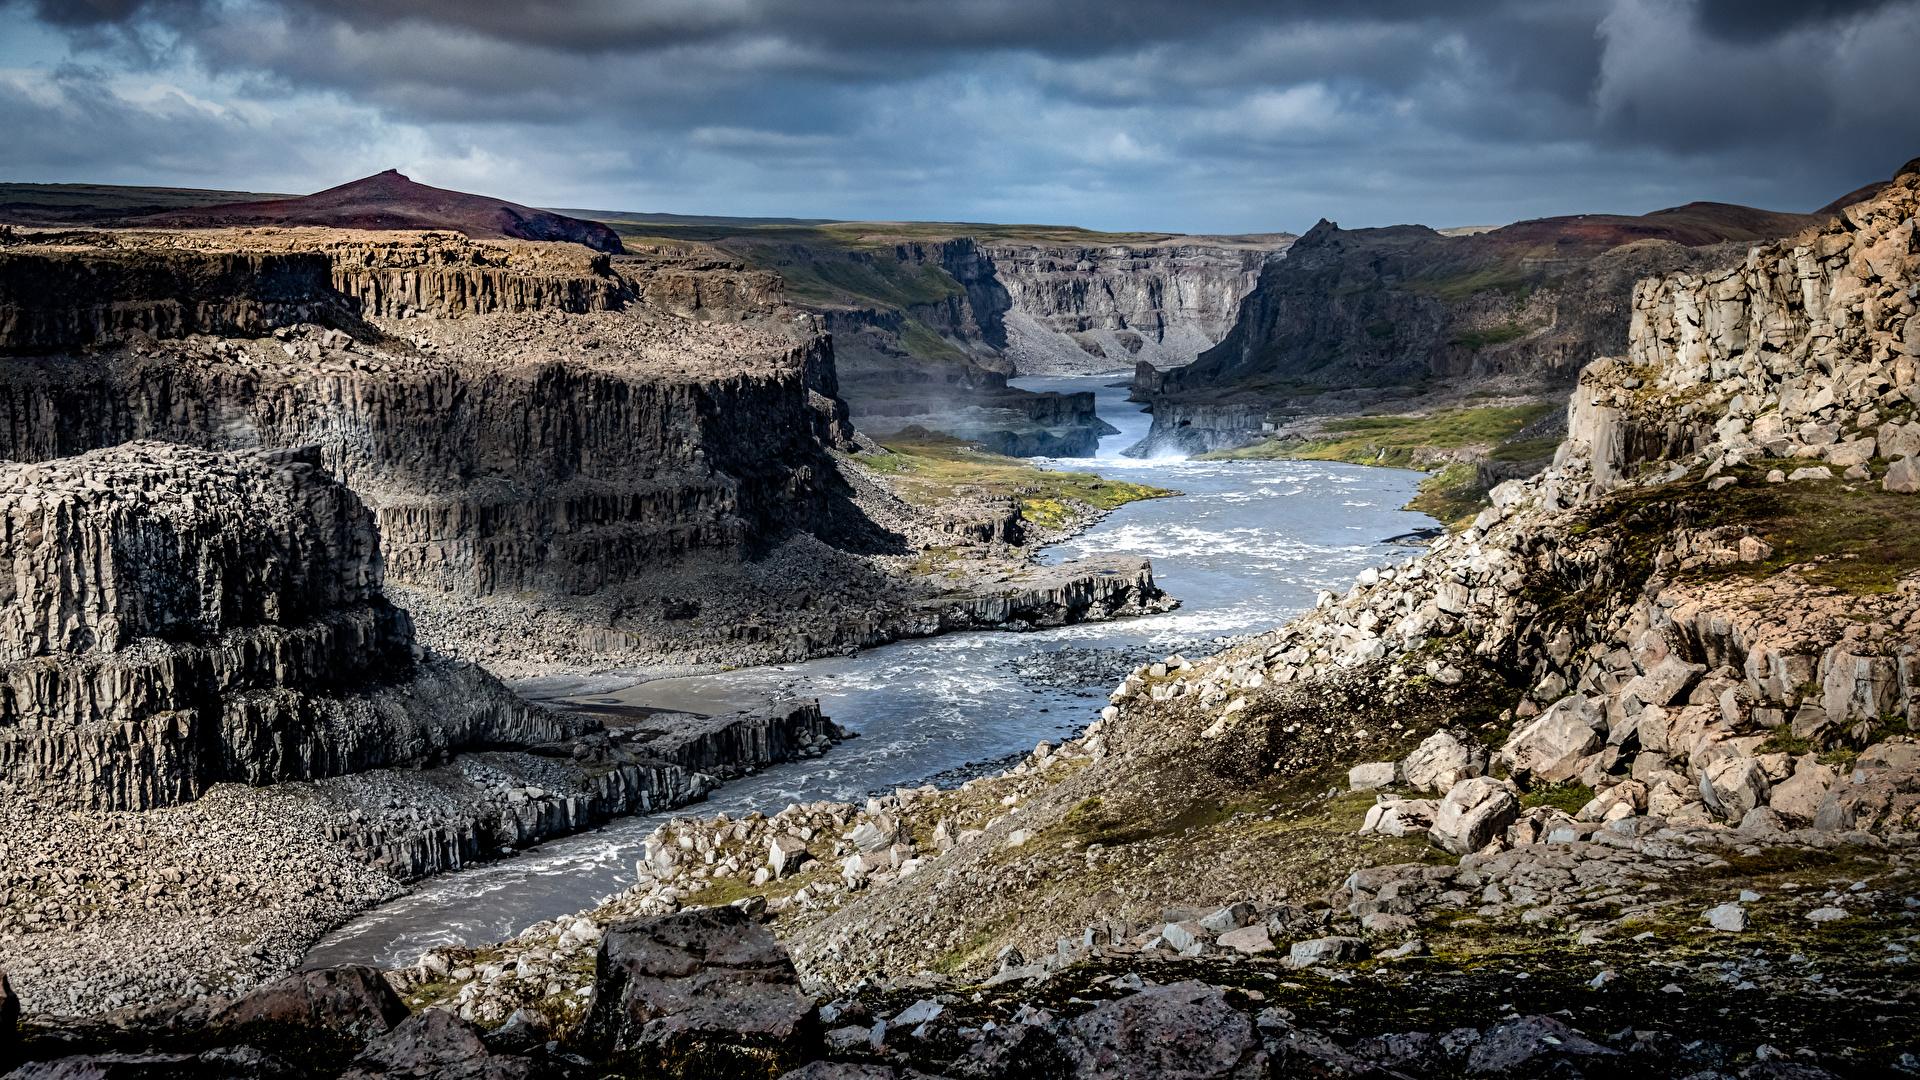 Картинки Исландия Jökulsárgljúfur Canyon Утес каньона Природа Реки Камни 1920x1080 Скала скале скалы Каньон каньоны река речка Камень